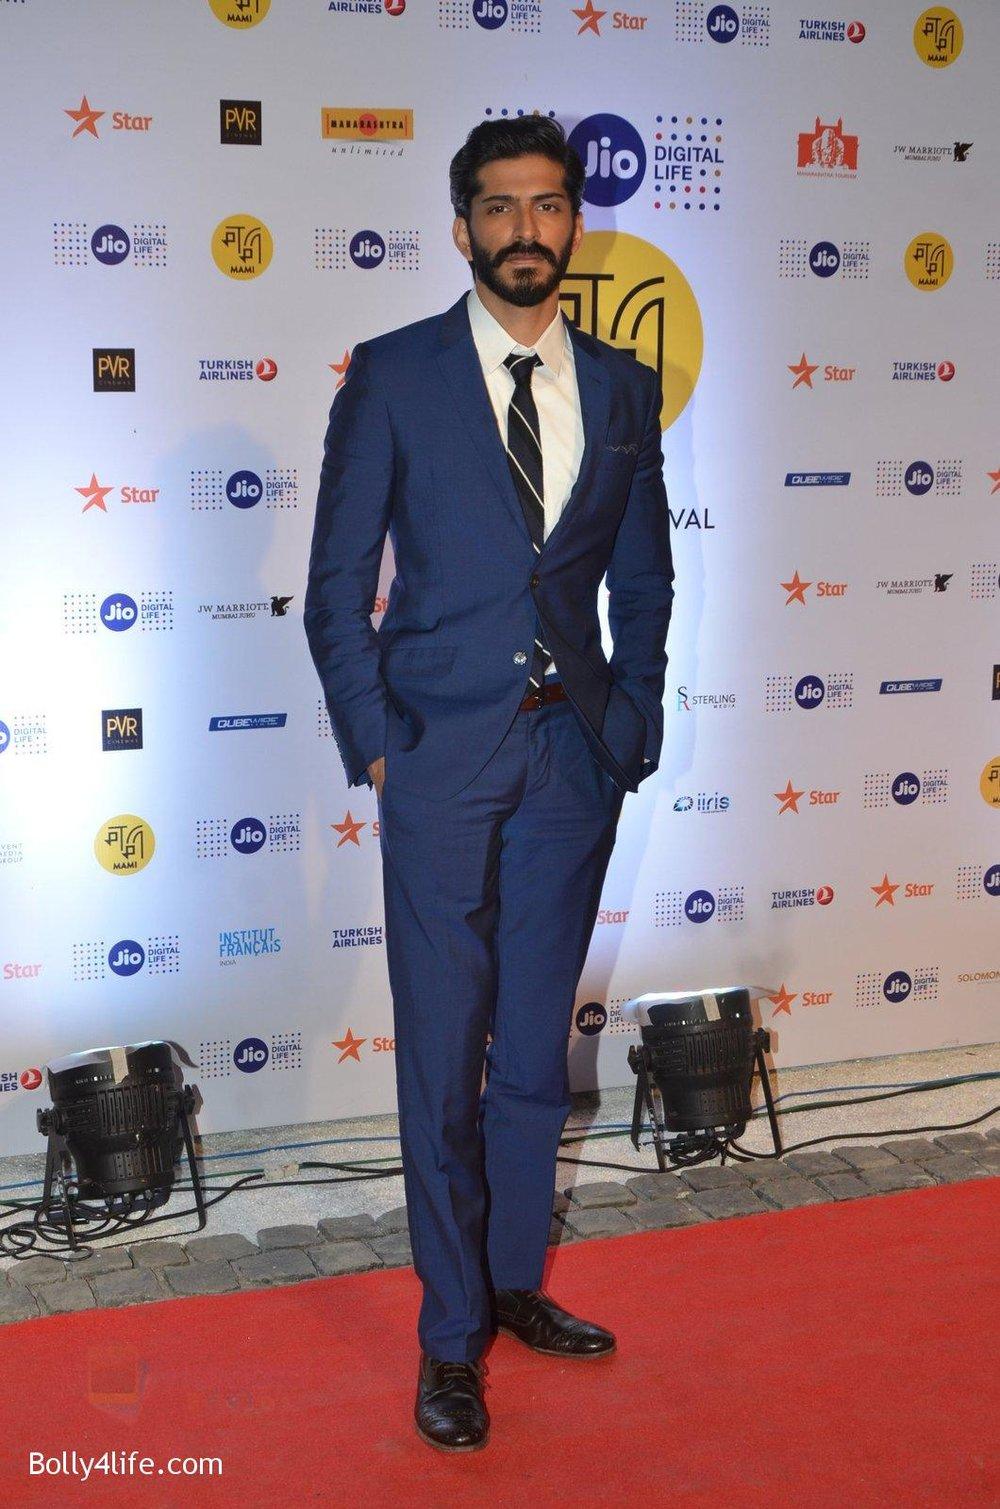 Harshvardhan-Kapoor-at-MAMI-Film-Festival-2016-on-20th-Oct-2016-306.jpg